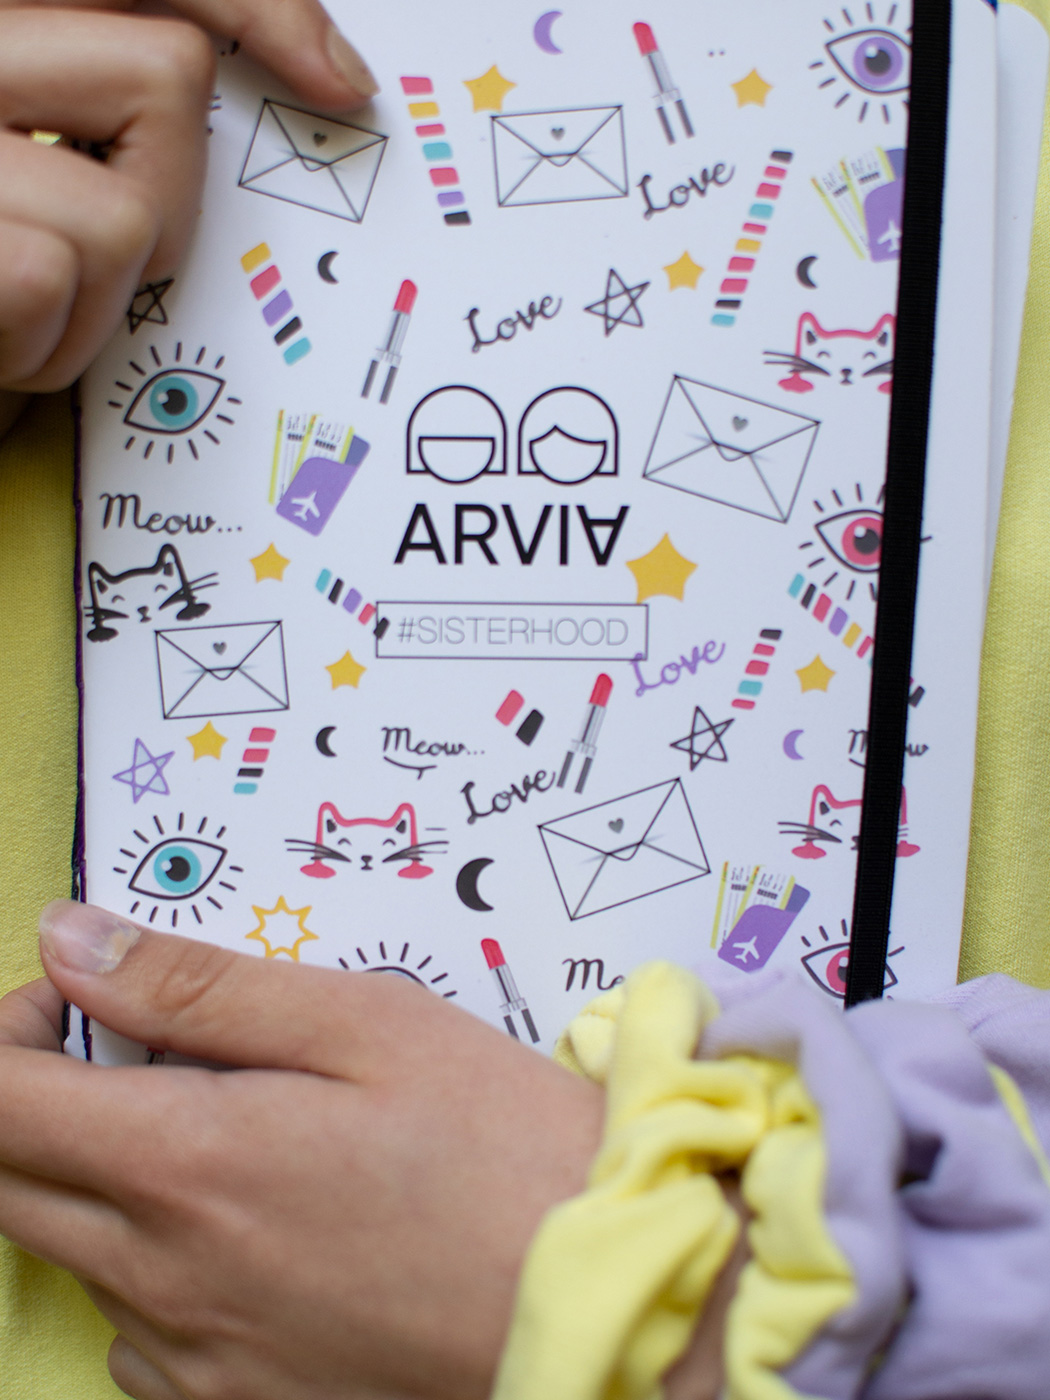 Agenda Sisterhood by ARVIA